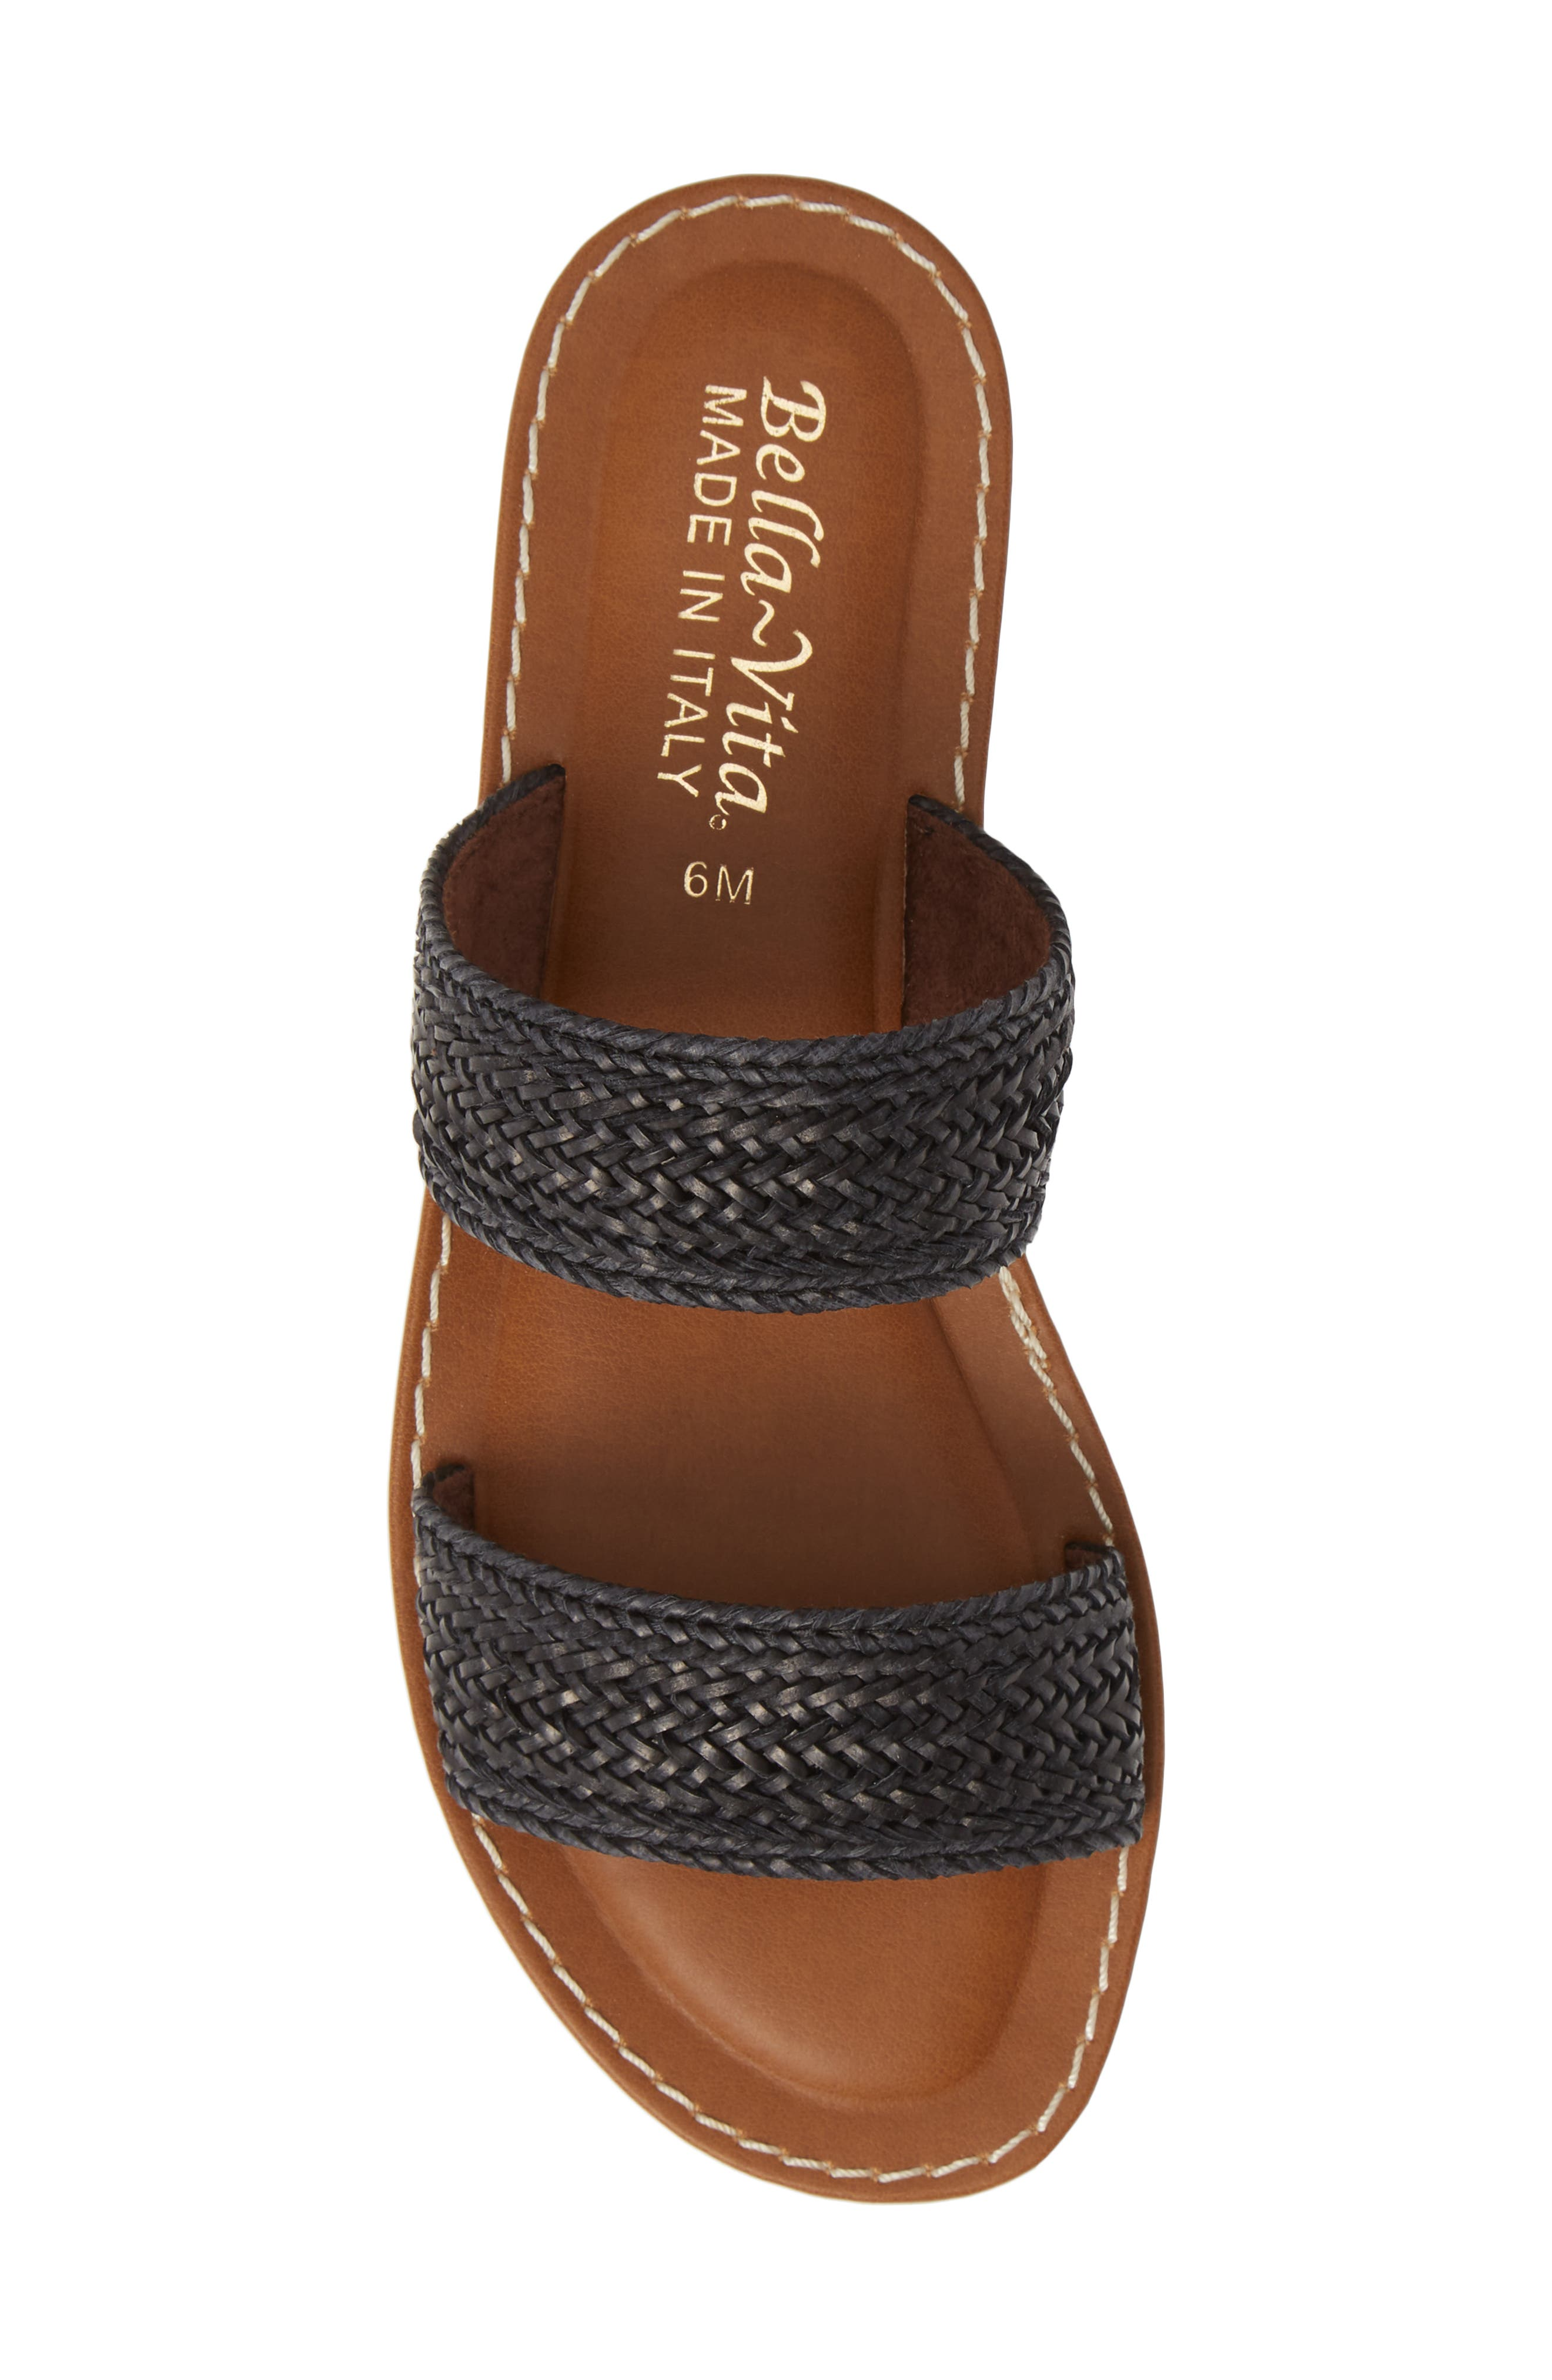 BELLA VITA, Two-Strap Slide Sandal, Alternate thumbnail 5, color, BLACK WOVEN